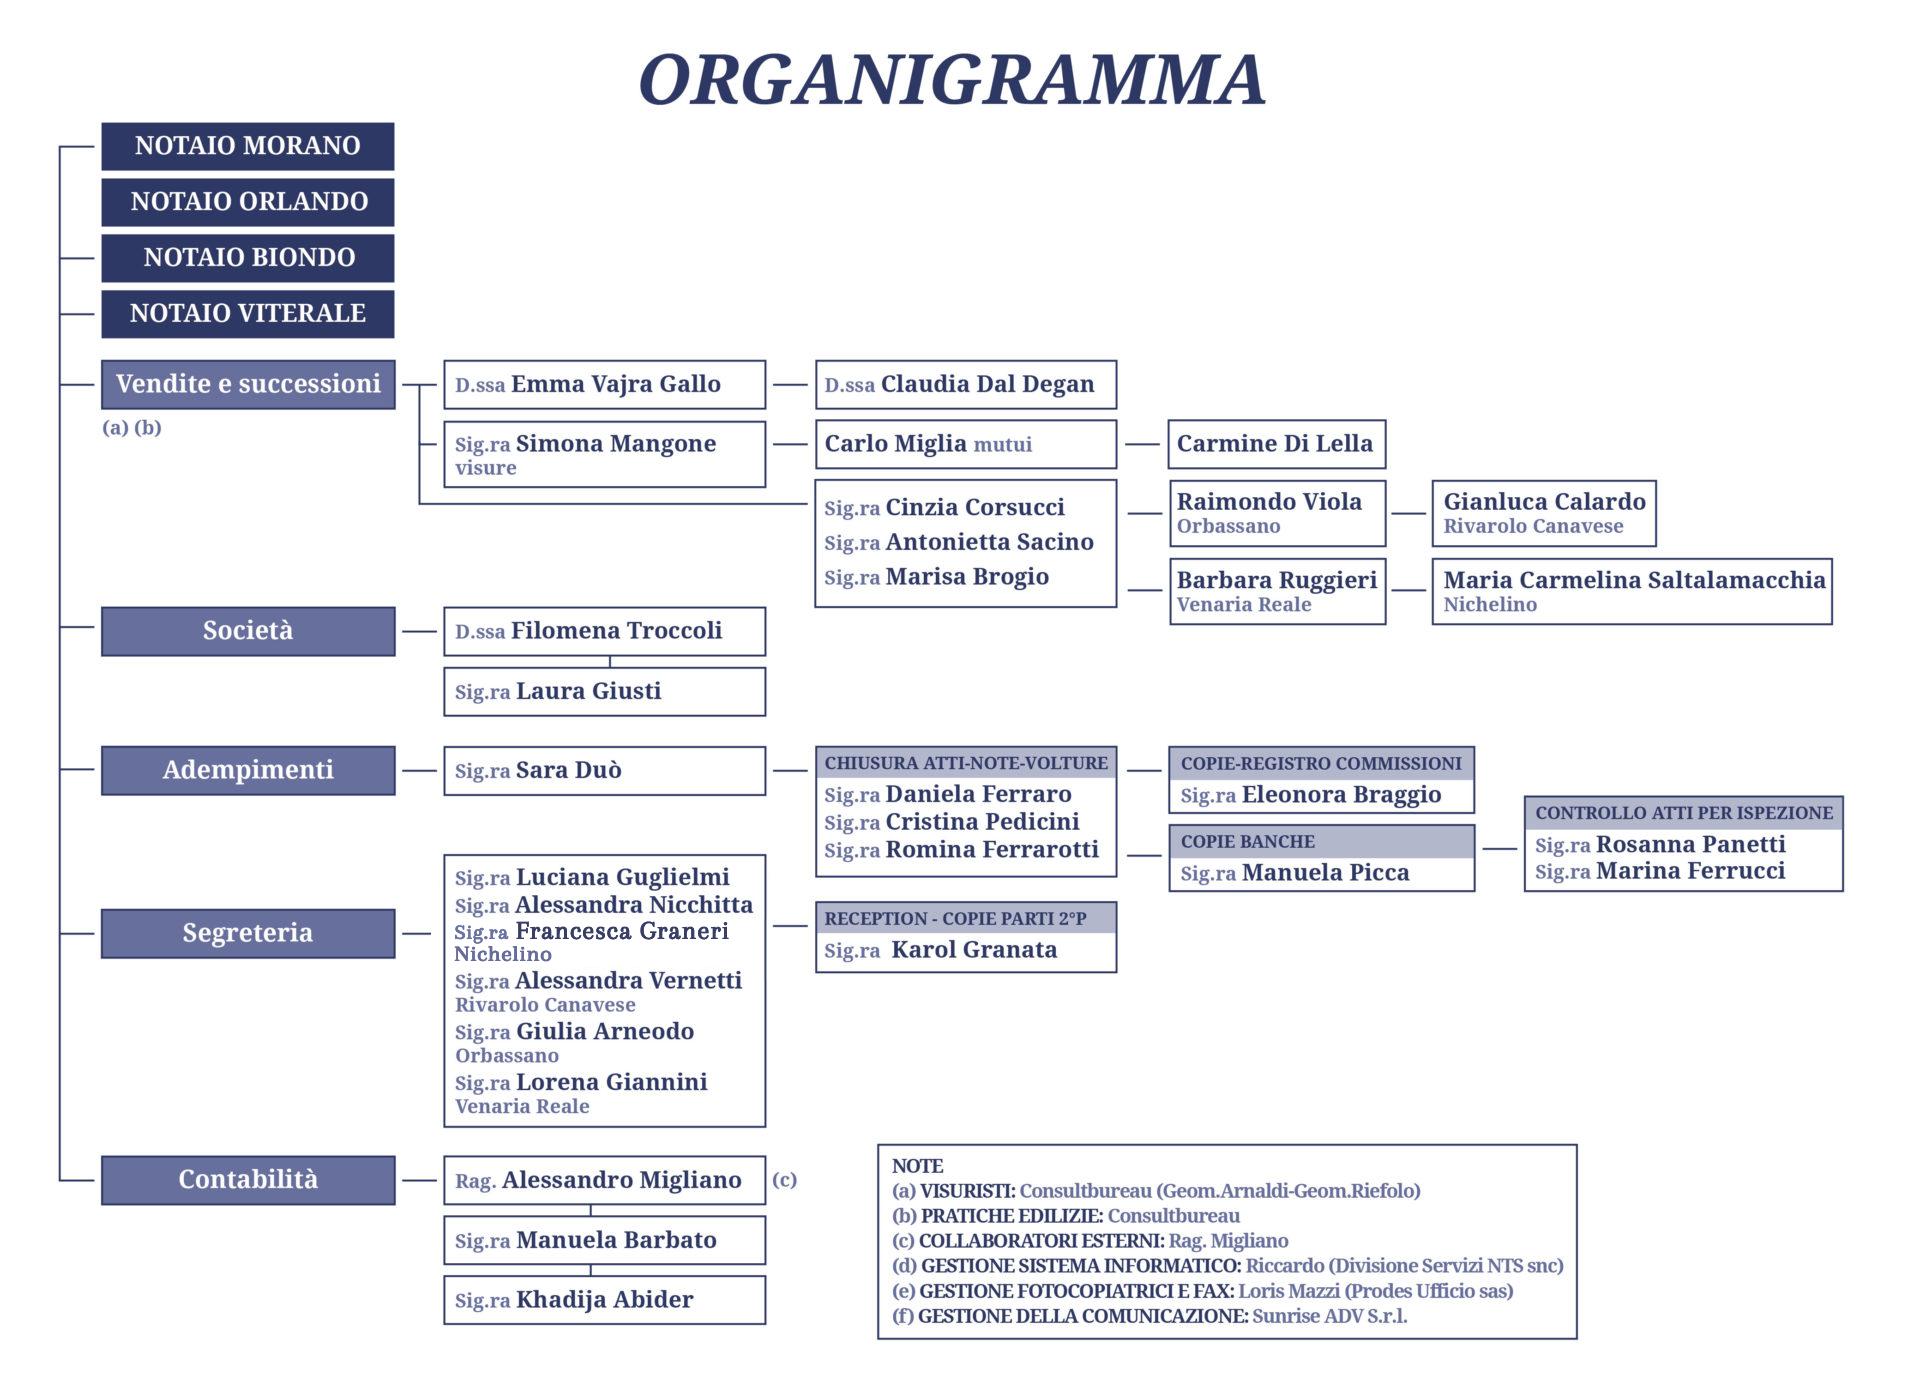 Organigramma Notai Piemontesi Associati Torino